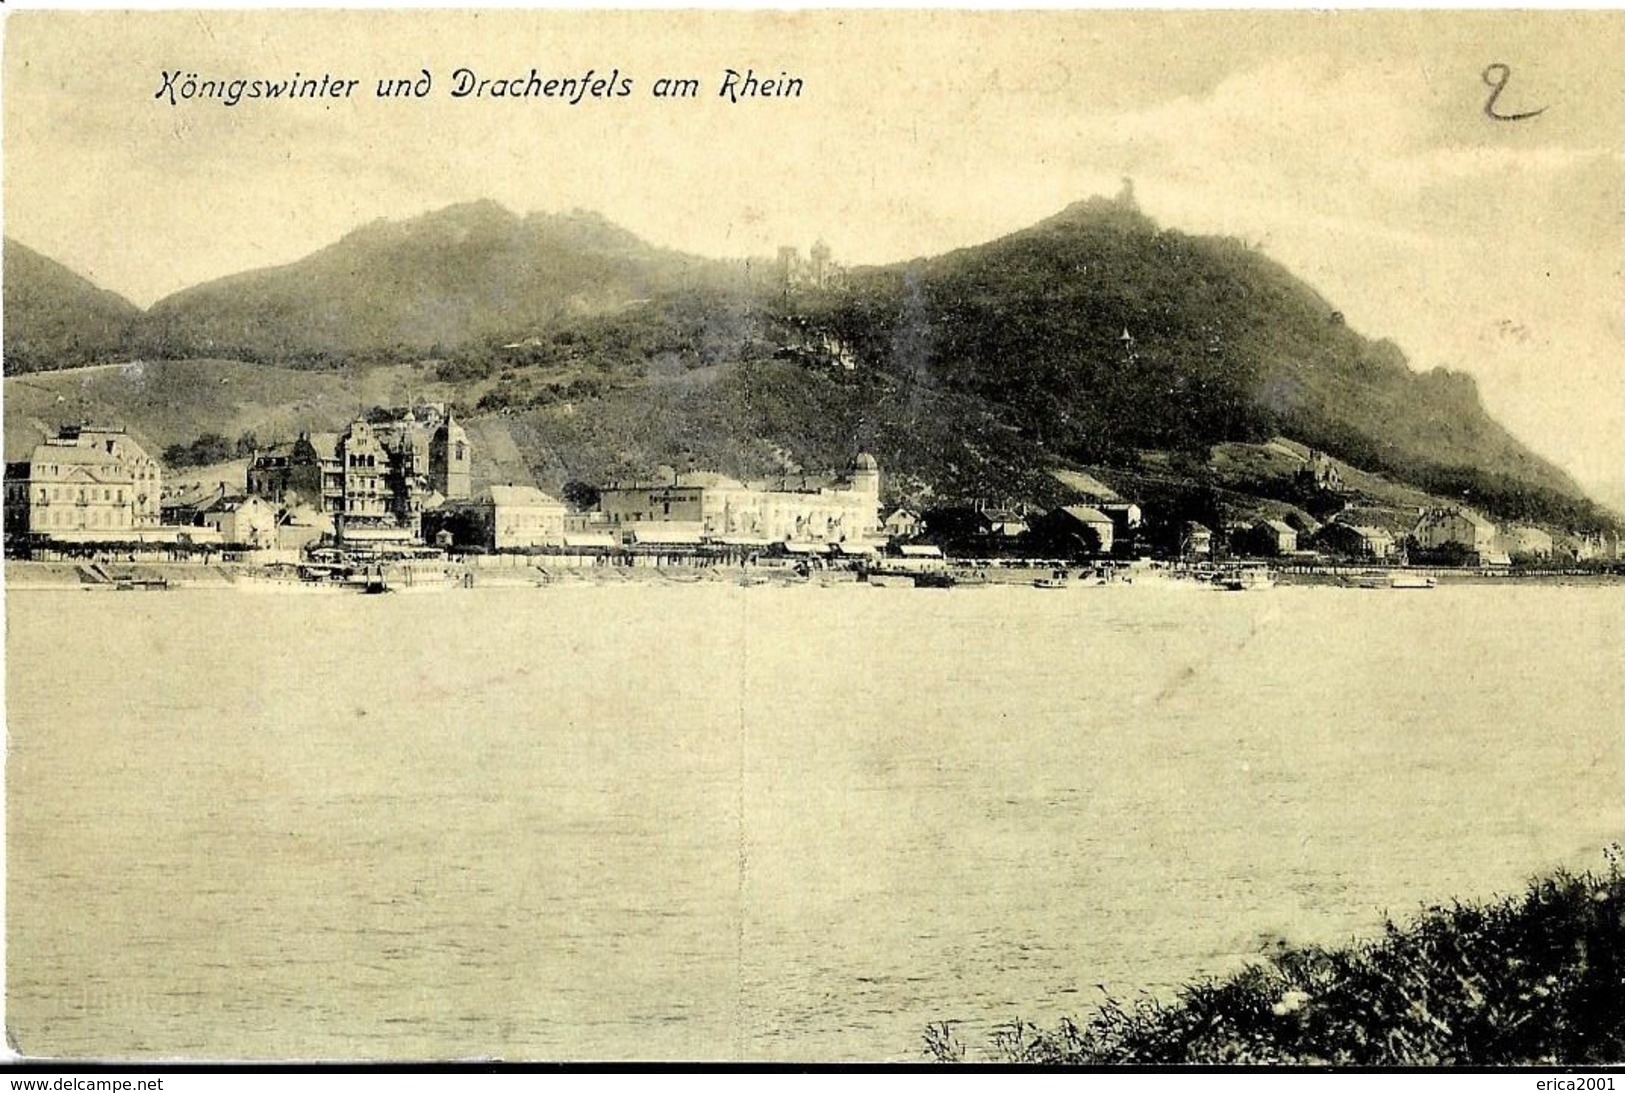 Koenigswinter. Koenigswinter Und Drachenfels Am Rhein. - Koenigswinter